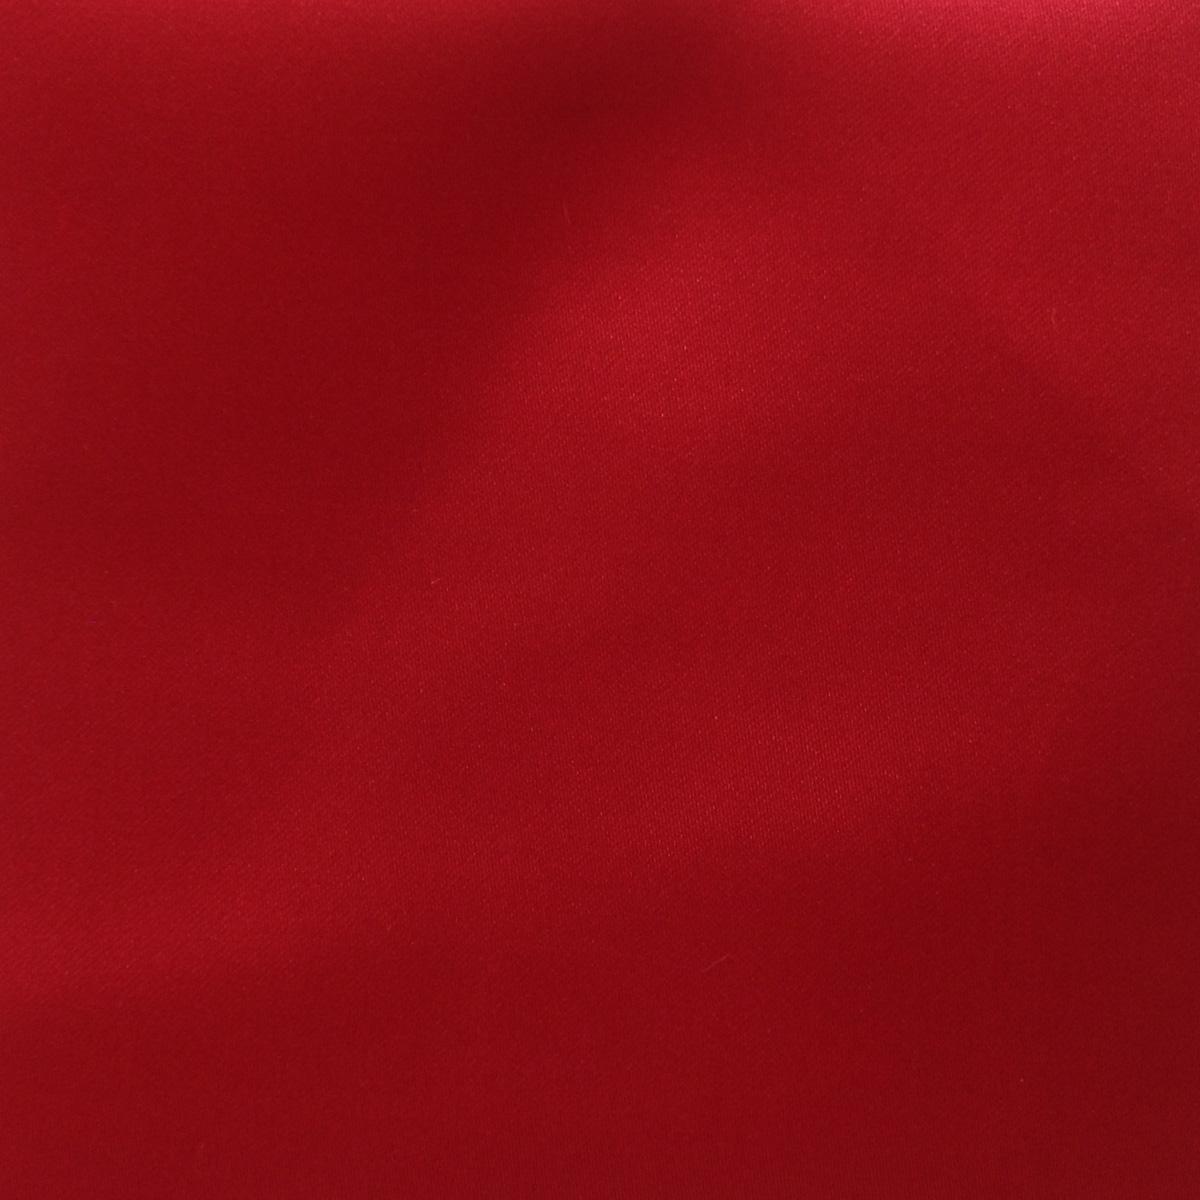 B1764 10 wine mens ties facemasks con murphys menswear cork - - Con Murphys Menswear